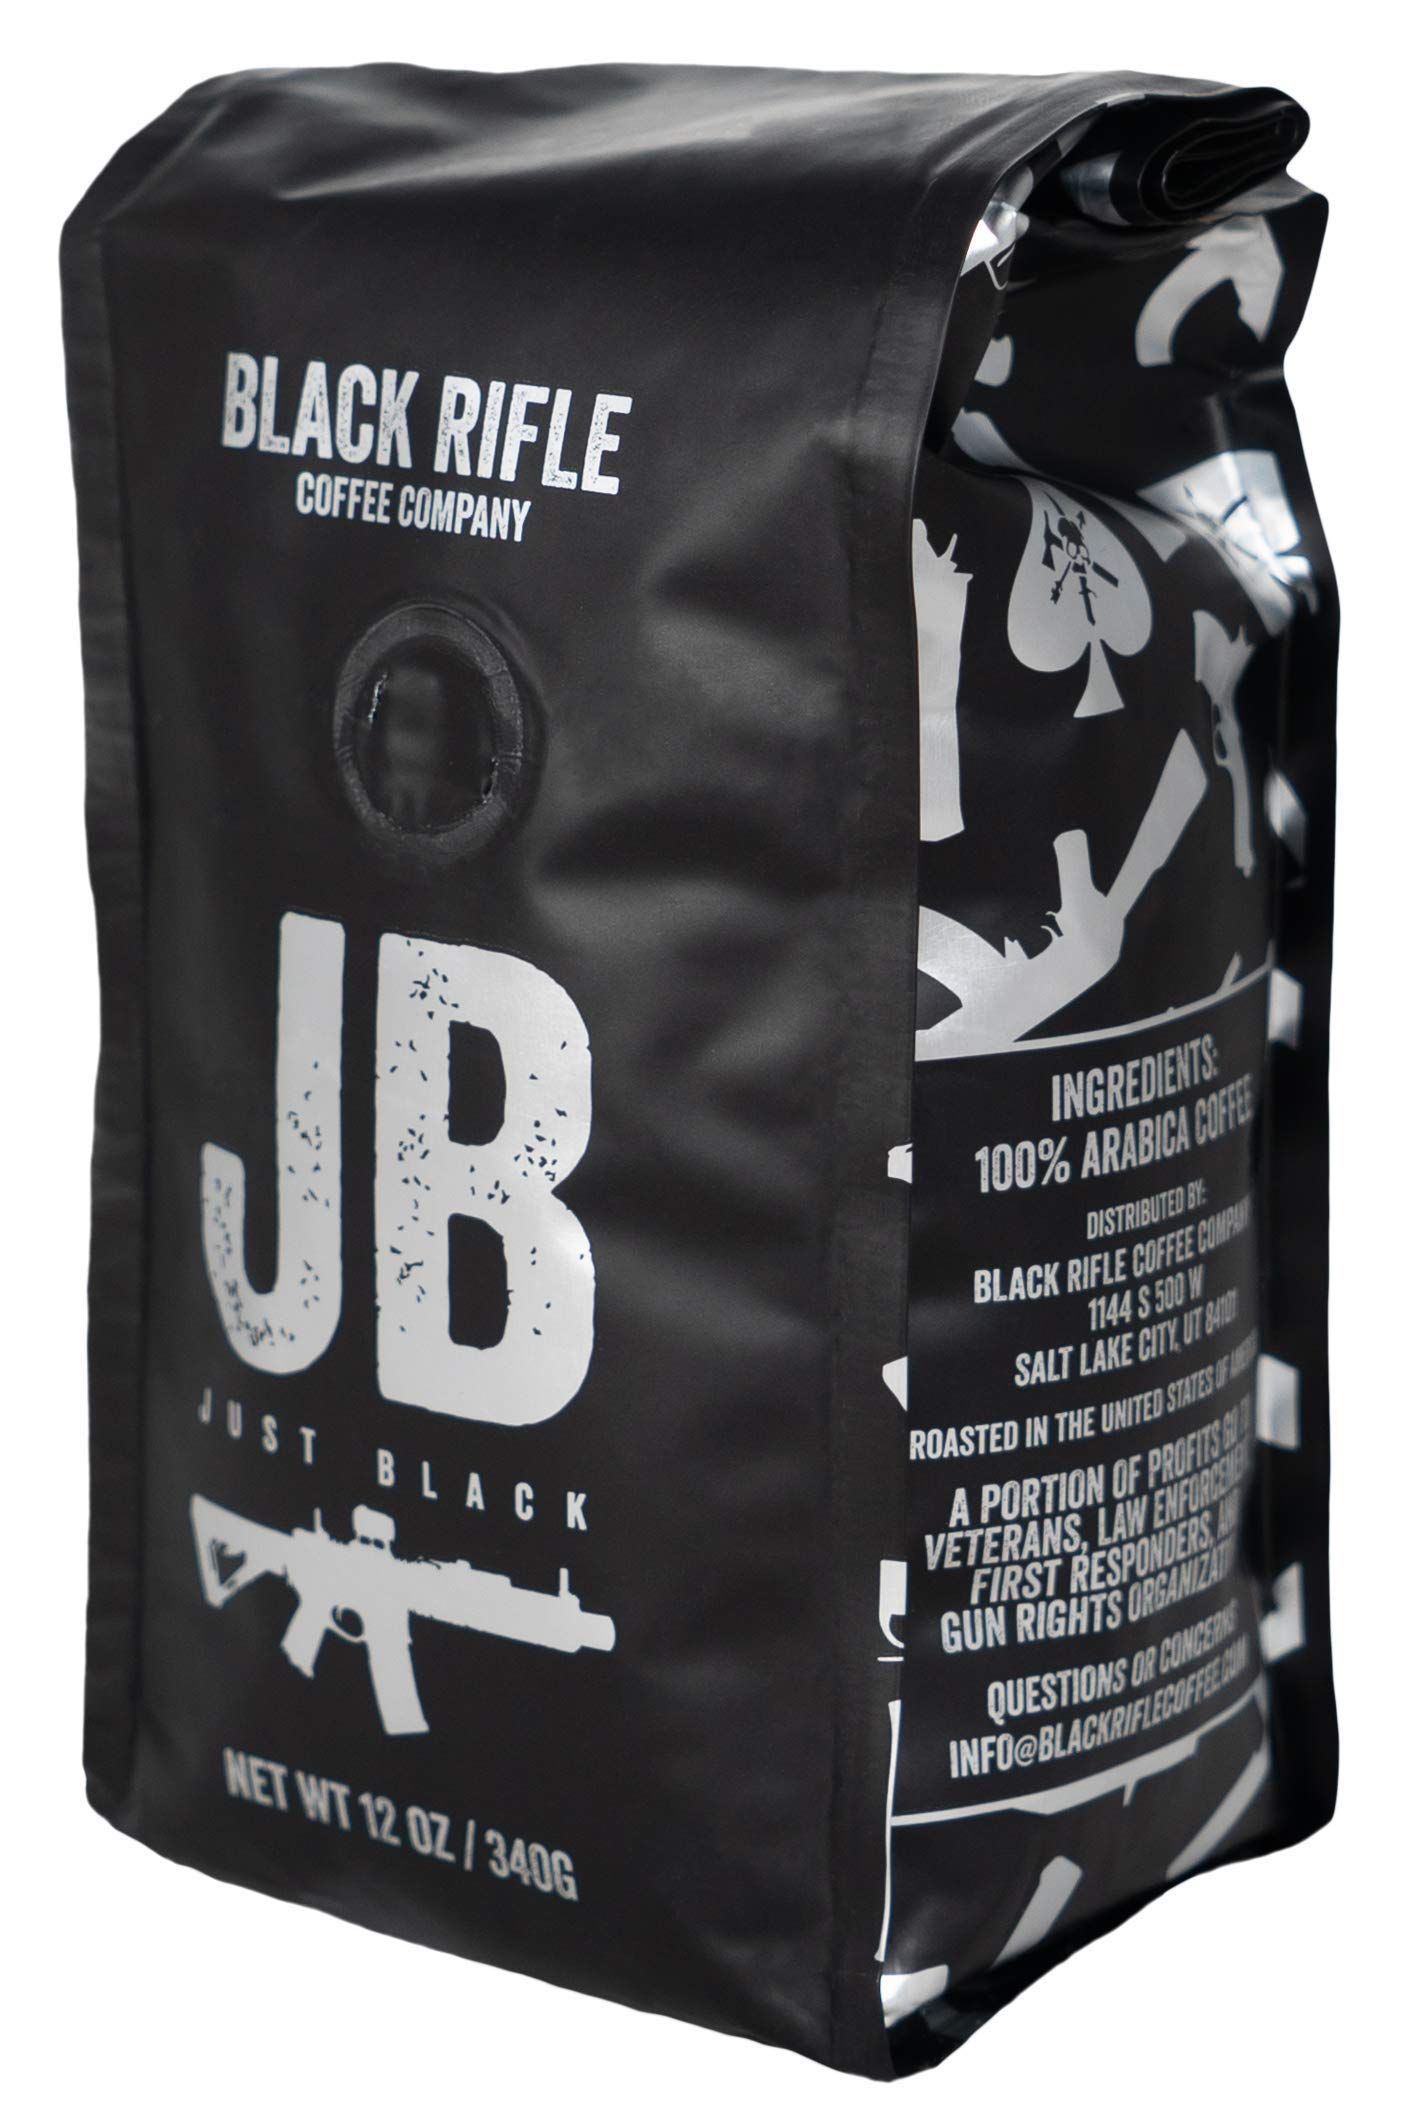 Black Rifle Coffee Company JB Just Black Dark Roast Ground Coffee, 12 Ounce Bag by Black Rifle Coffee Company